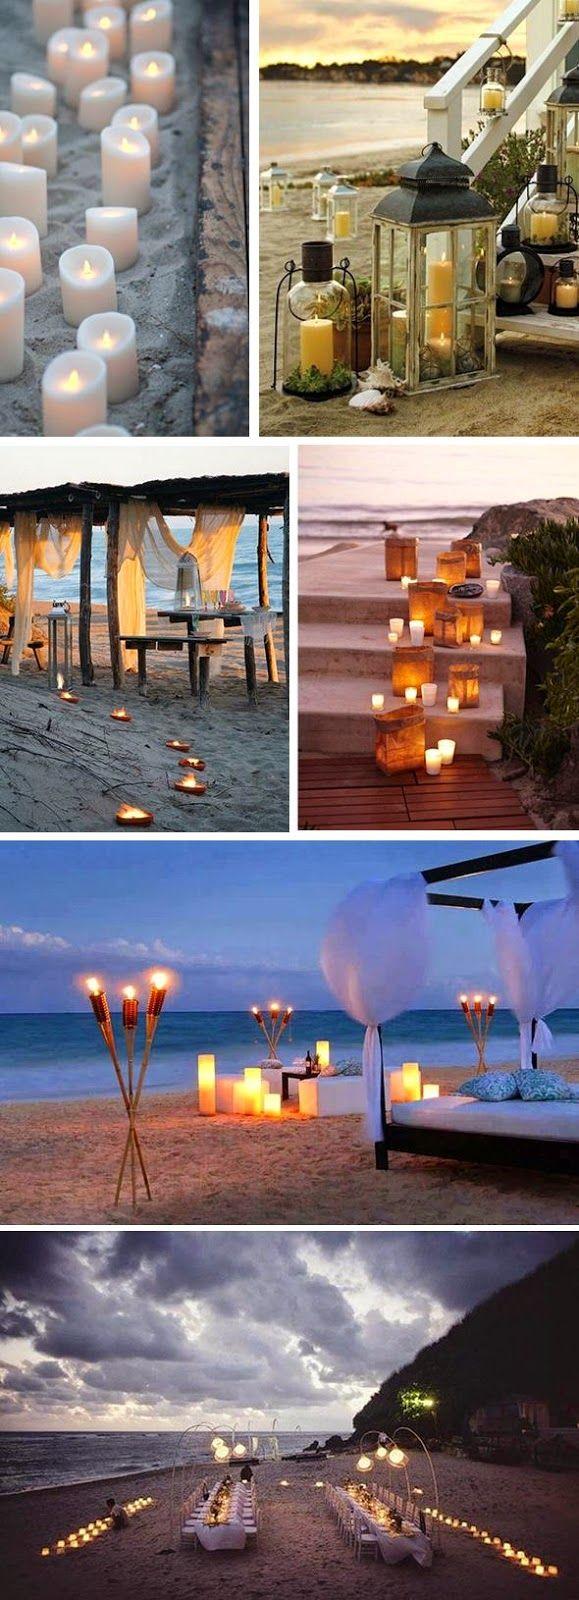 Beach Wedding Decorations - Tips For an Awesome Beach Wedding!| Read more:   http://simpleweddingstuff.blogspot.com/2015/04/beach-wedding-decorations-tips-for.html